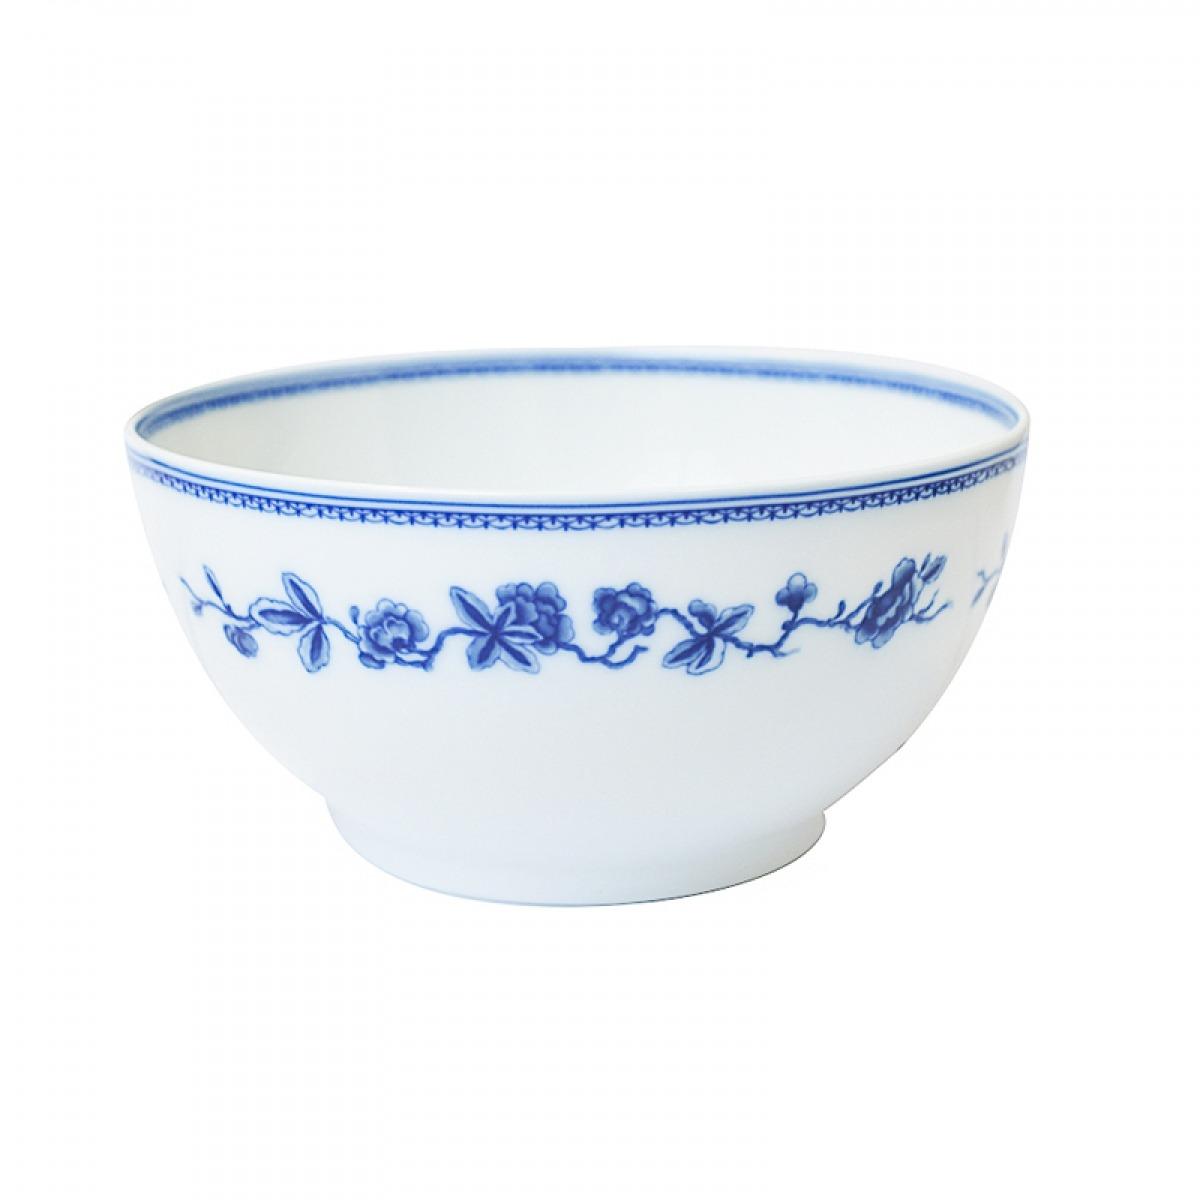 Saladeira Blue Macau Matisse Casa Vista Alegre M